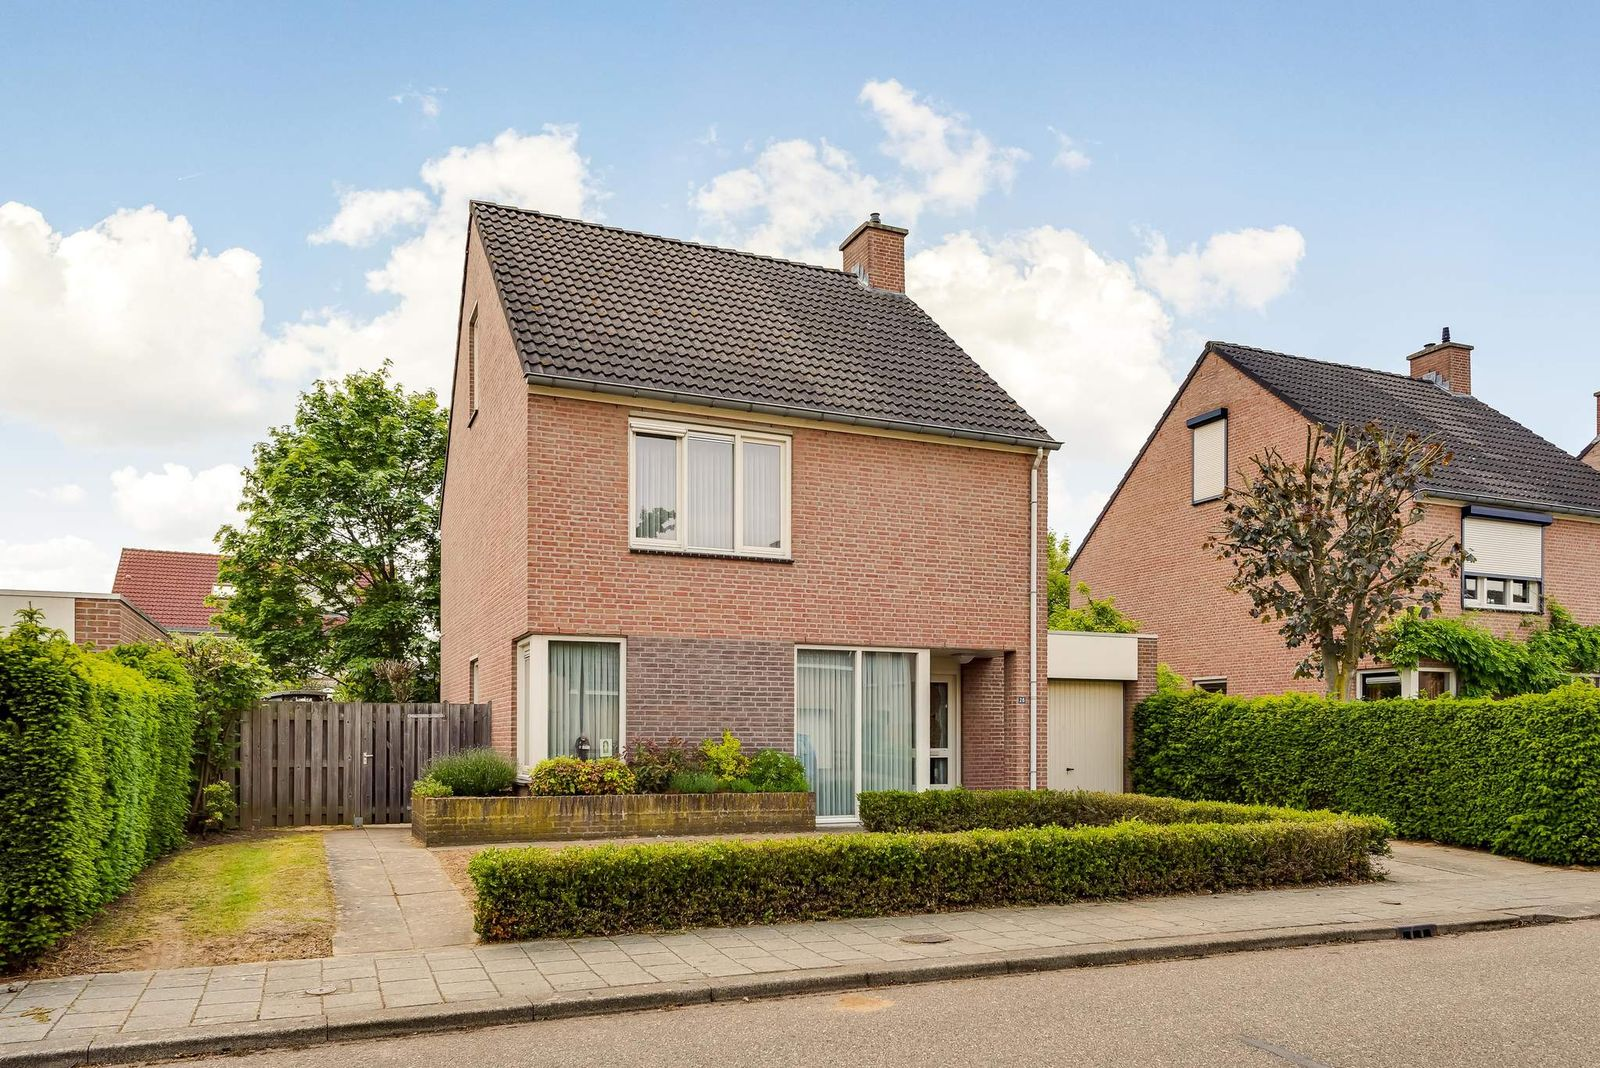 Brikkenoven 28, Roermond